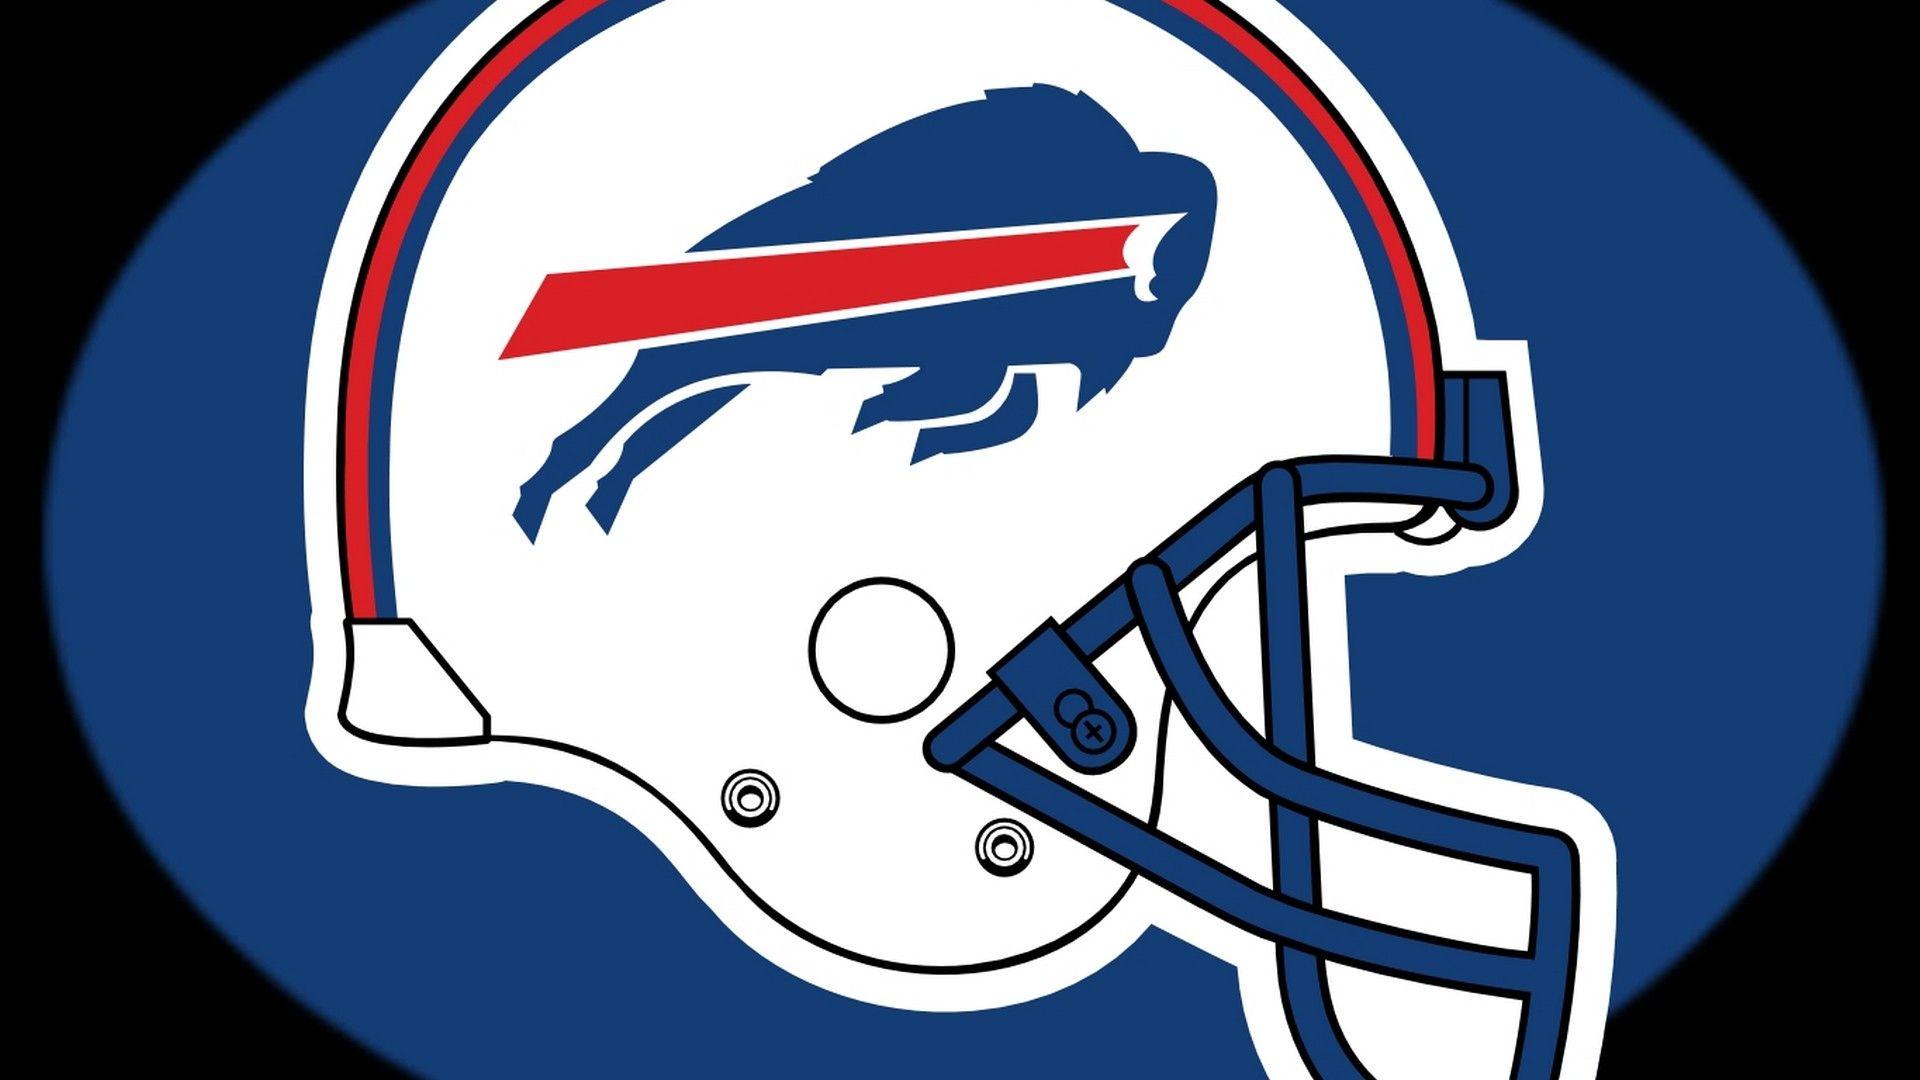 Buffalo Bills Nfl For Pc Wallpaper 2021 Nfl Football Wallpapers Nfl Football Wallpaper Football Helmets Buffalo Bills Logo